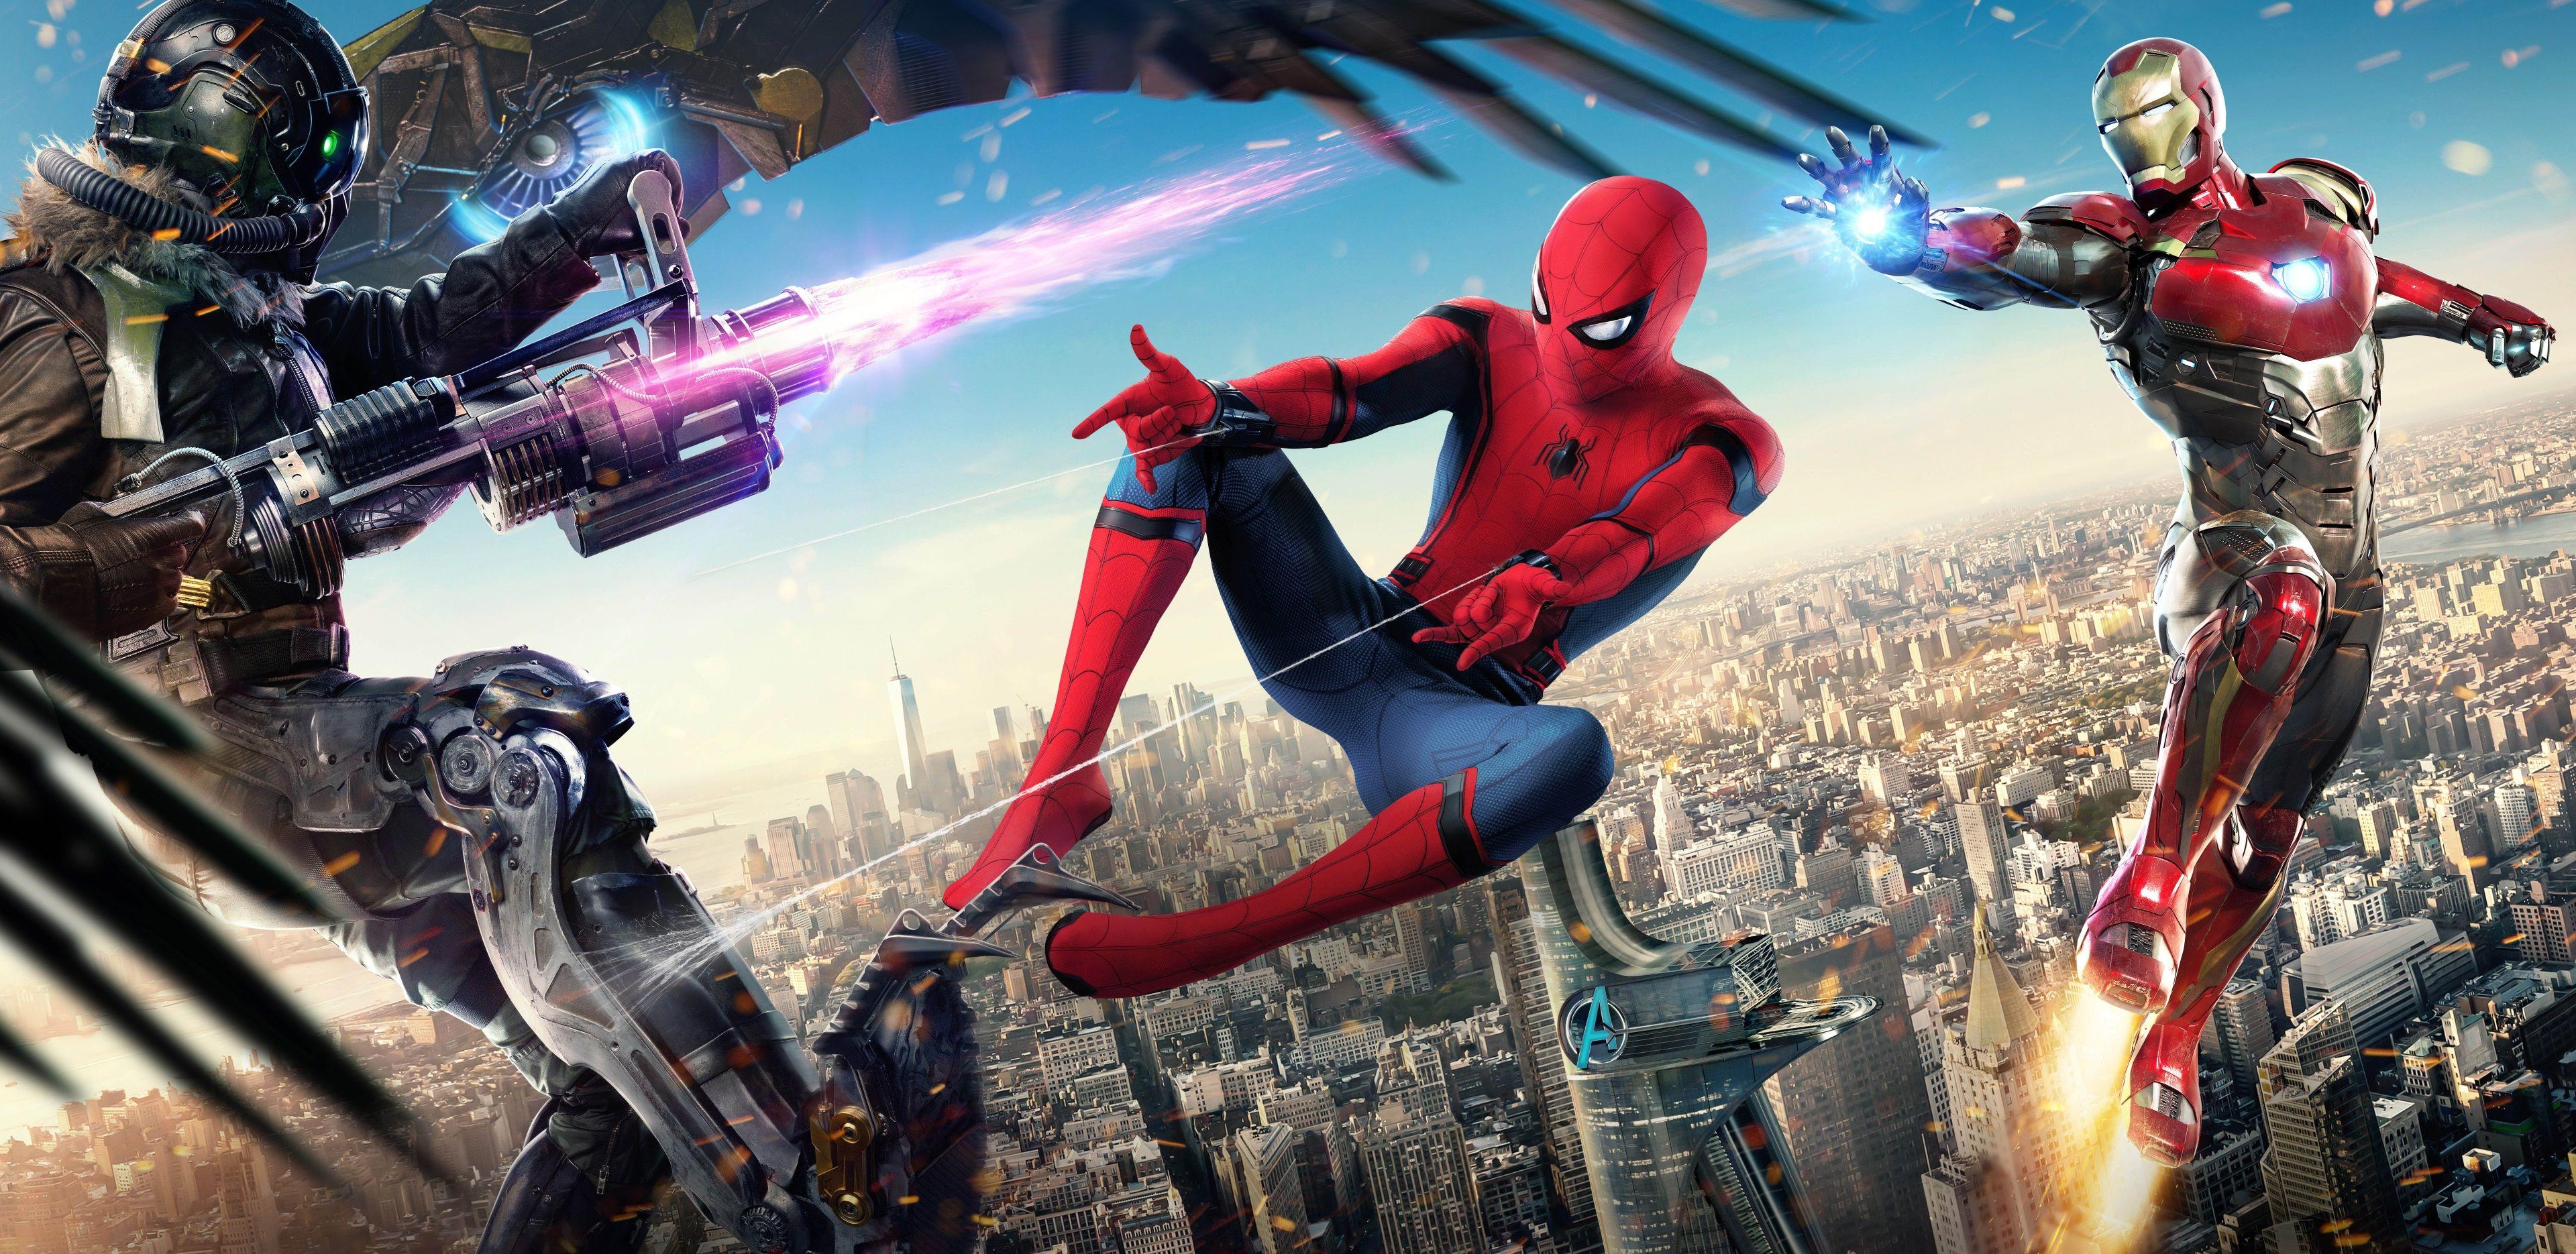 3840x1870 Spider Man Homecoming 4k Wallpaper Hd Backgrounds Images Iron Man Wallpaper Spiderman Iron Man Poster